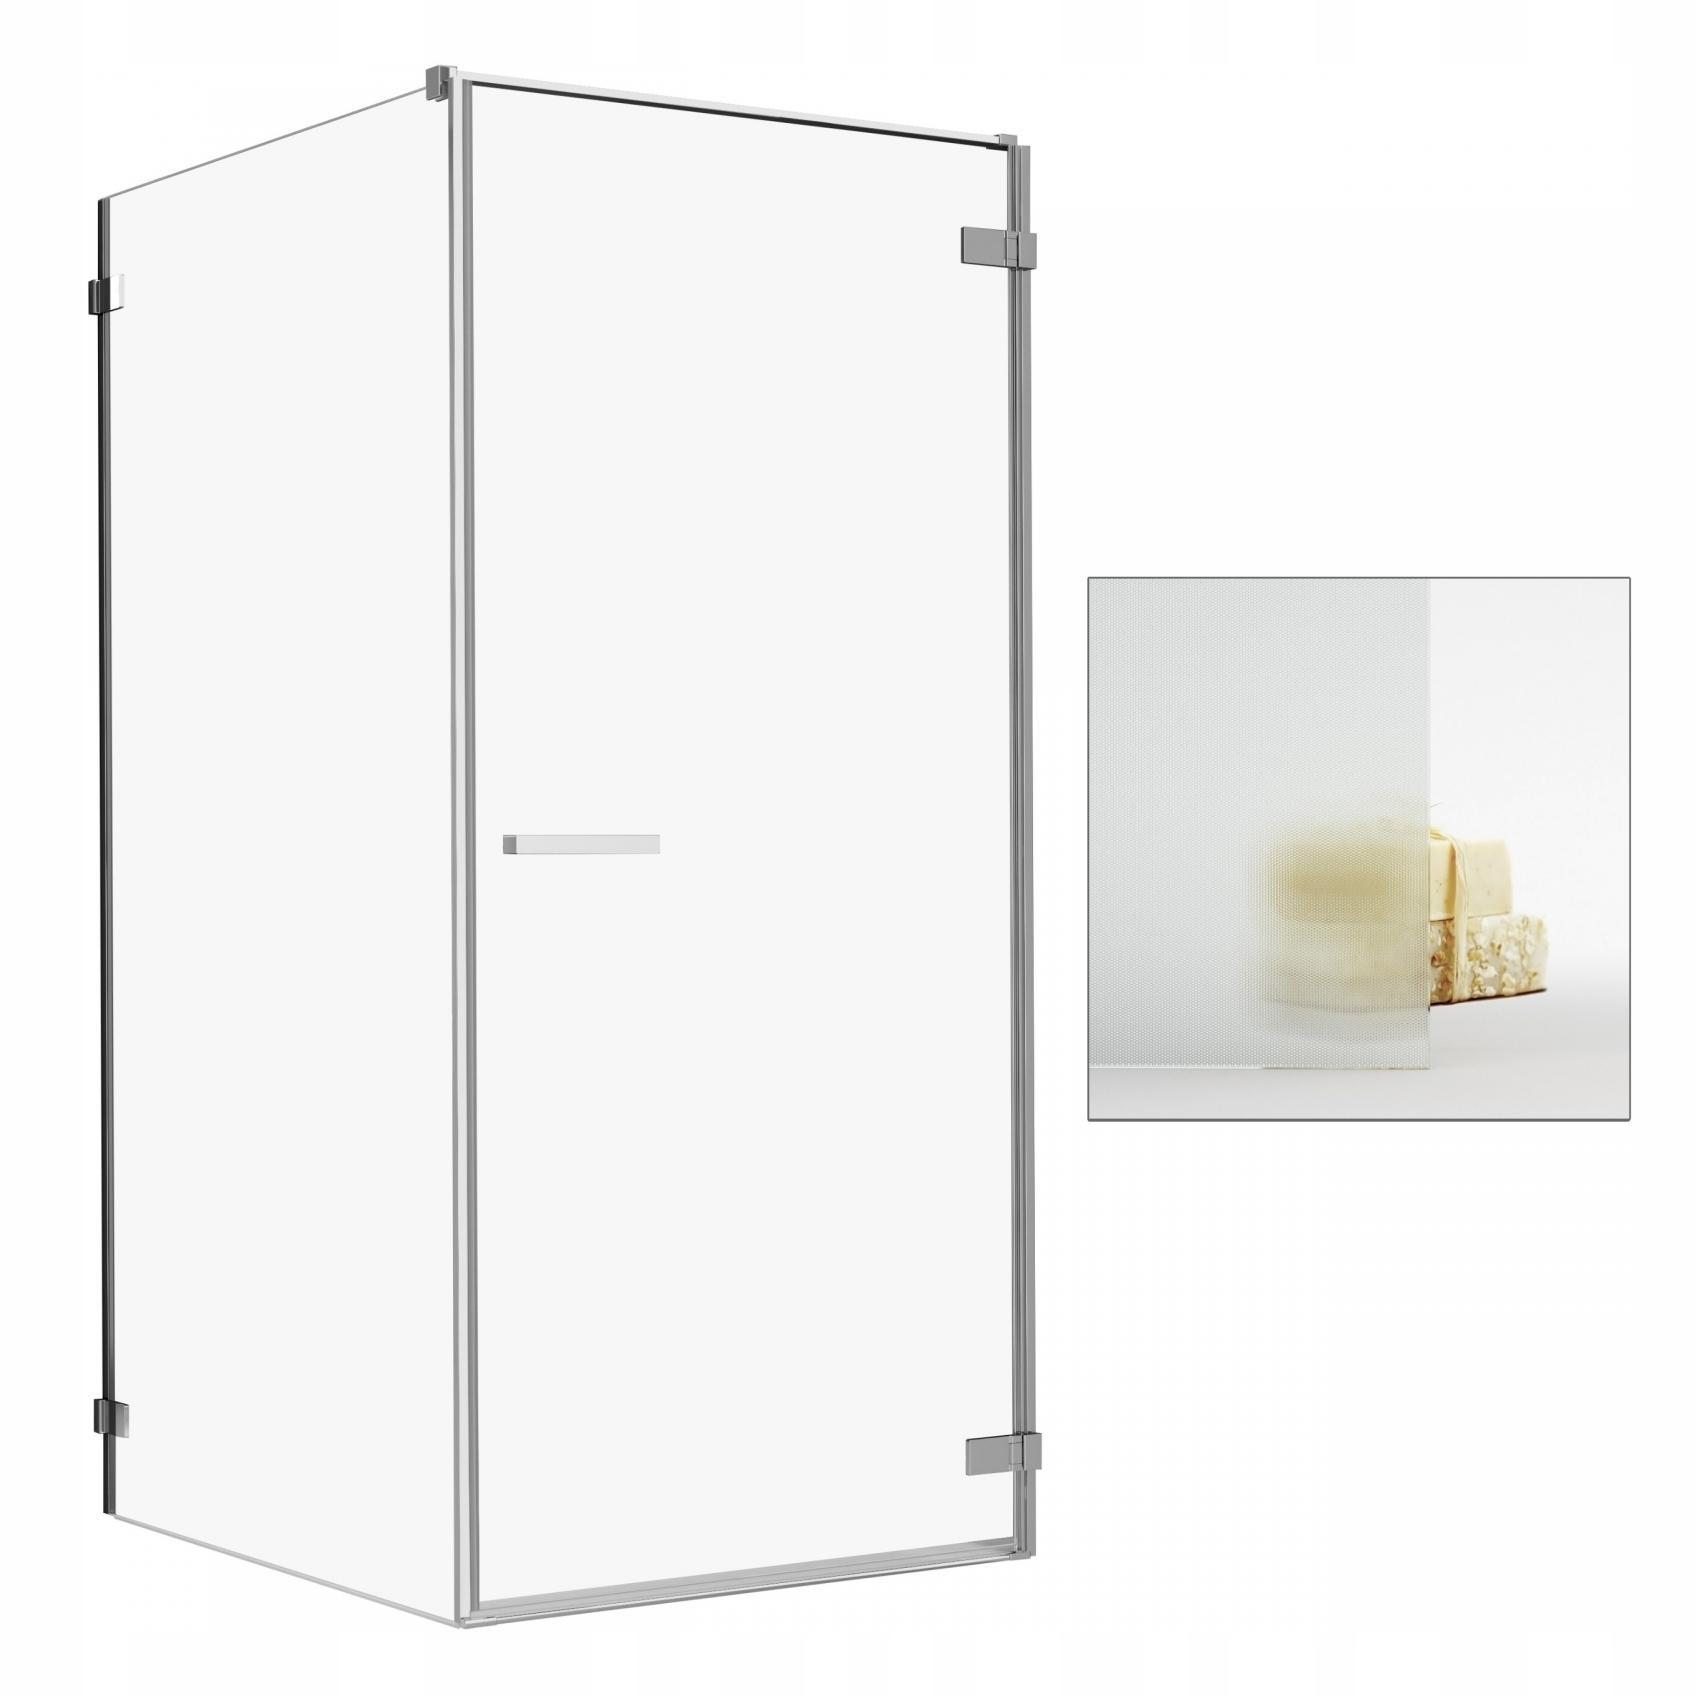 Sprcha Umenie A KDJ 90x70cm S pixarena